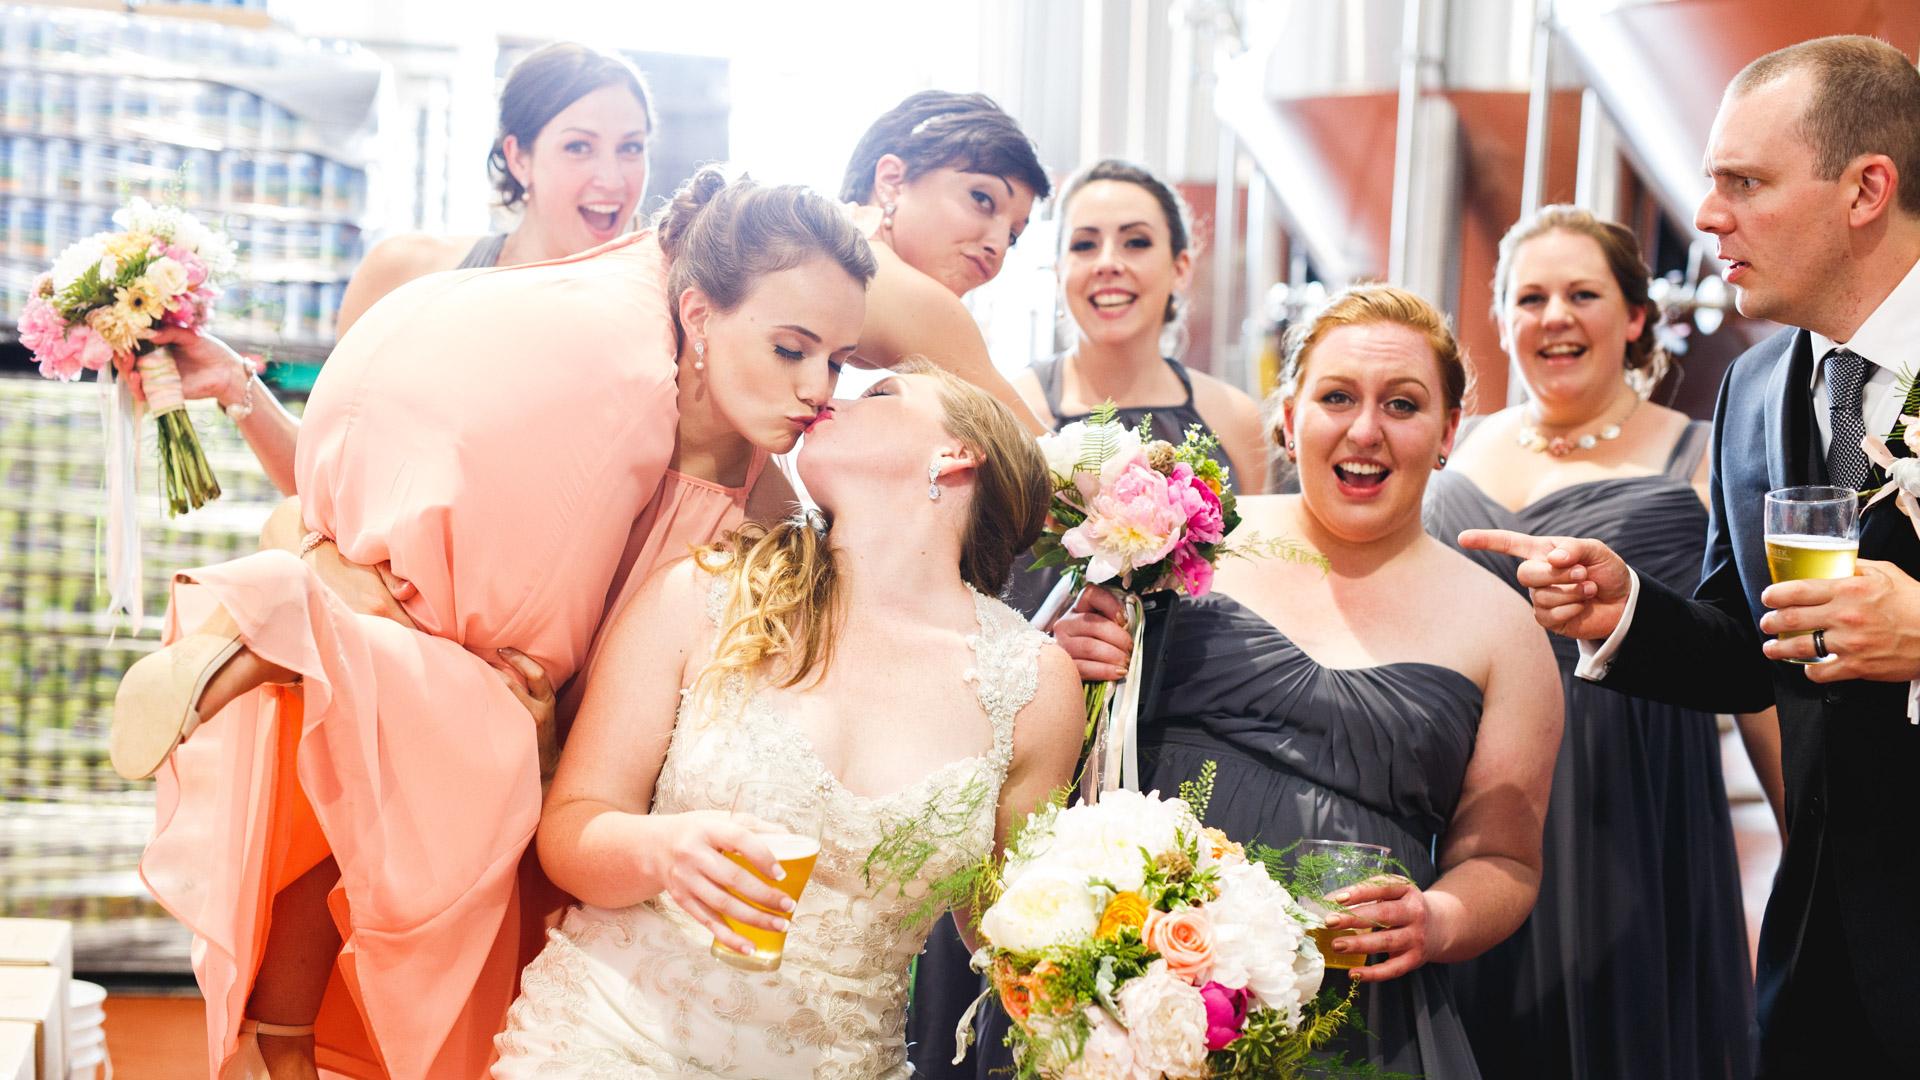 Candid-Brewery-Wedding-Photo-Crazy.jpg